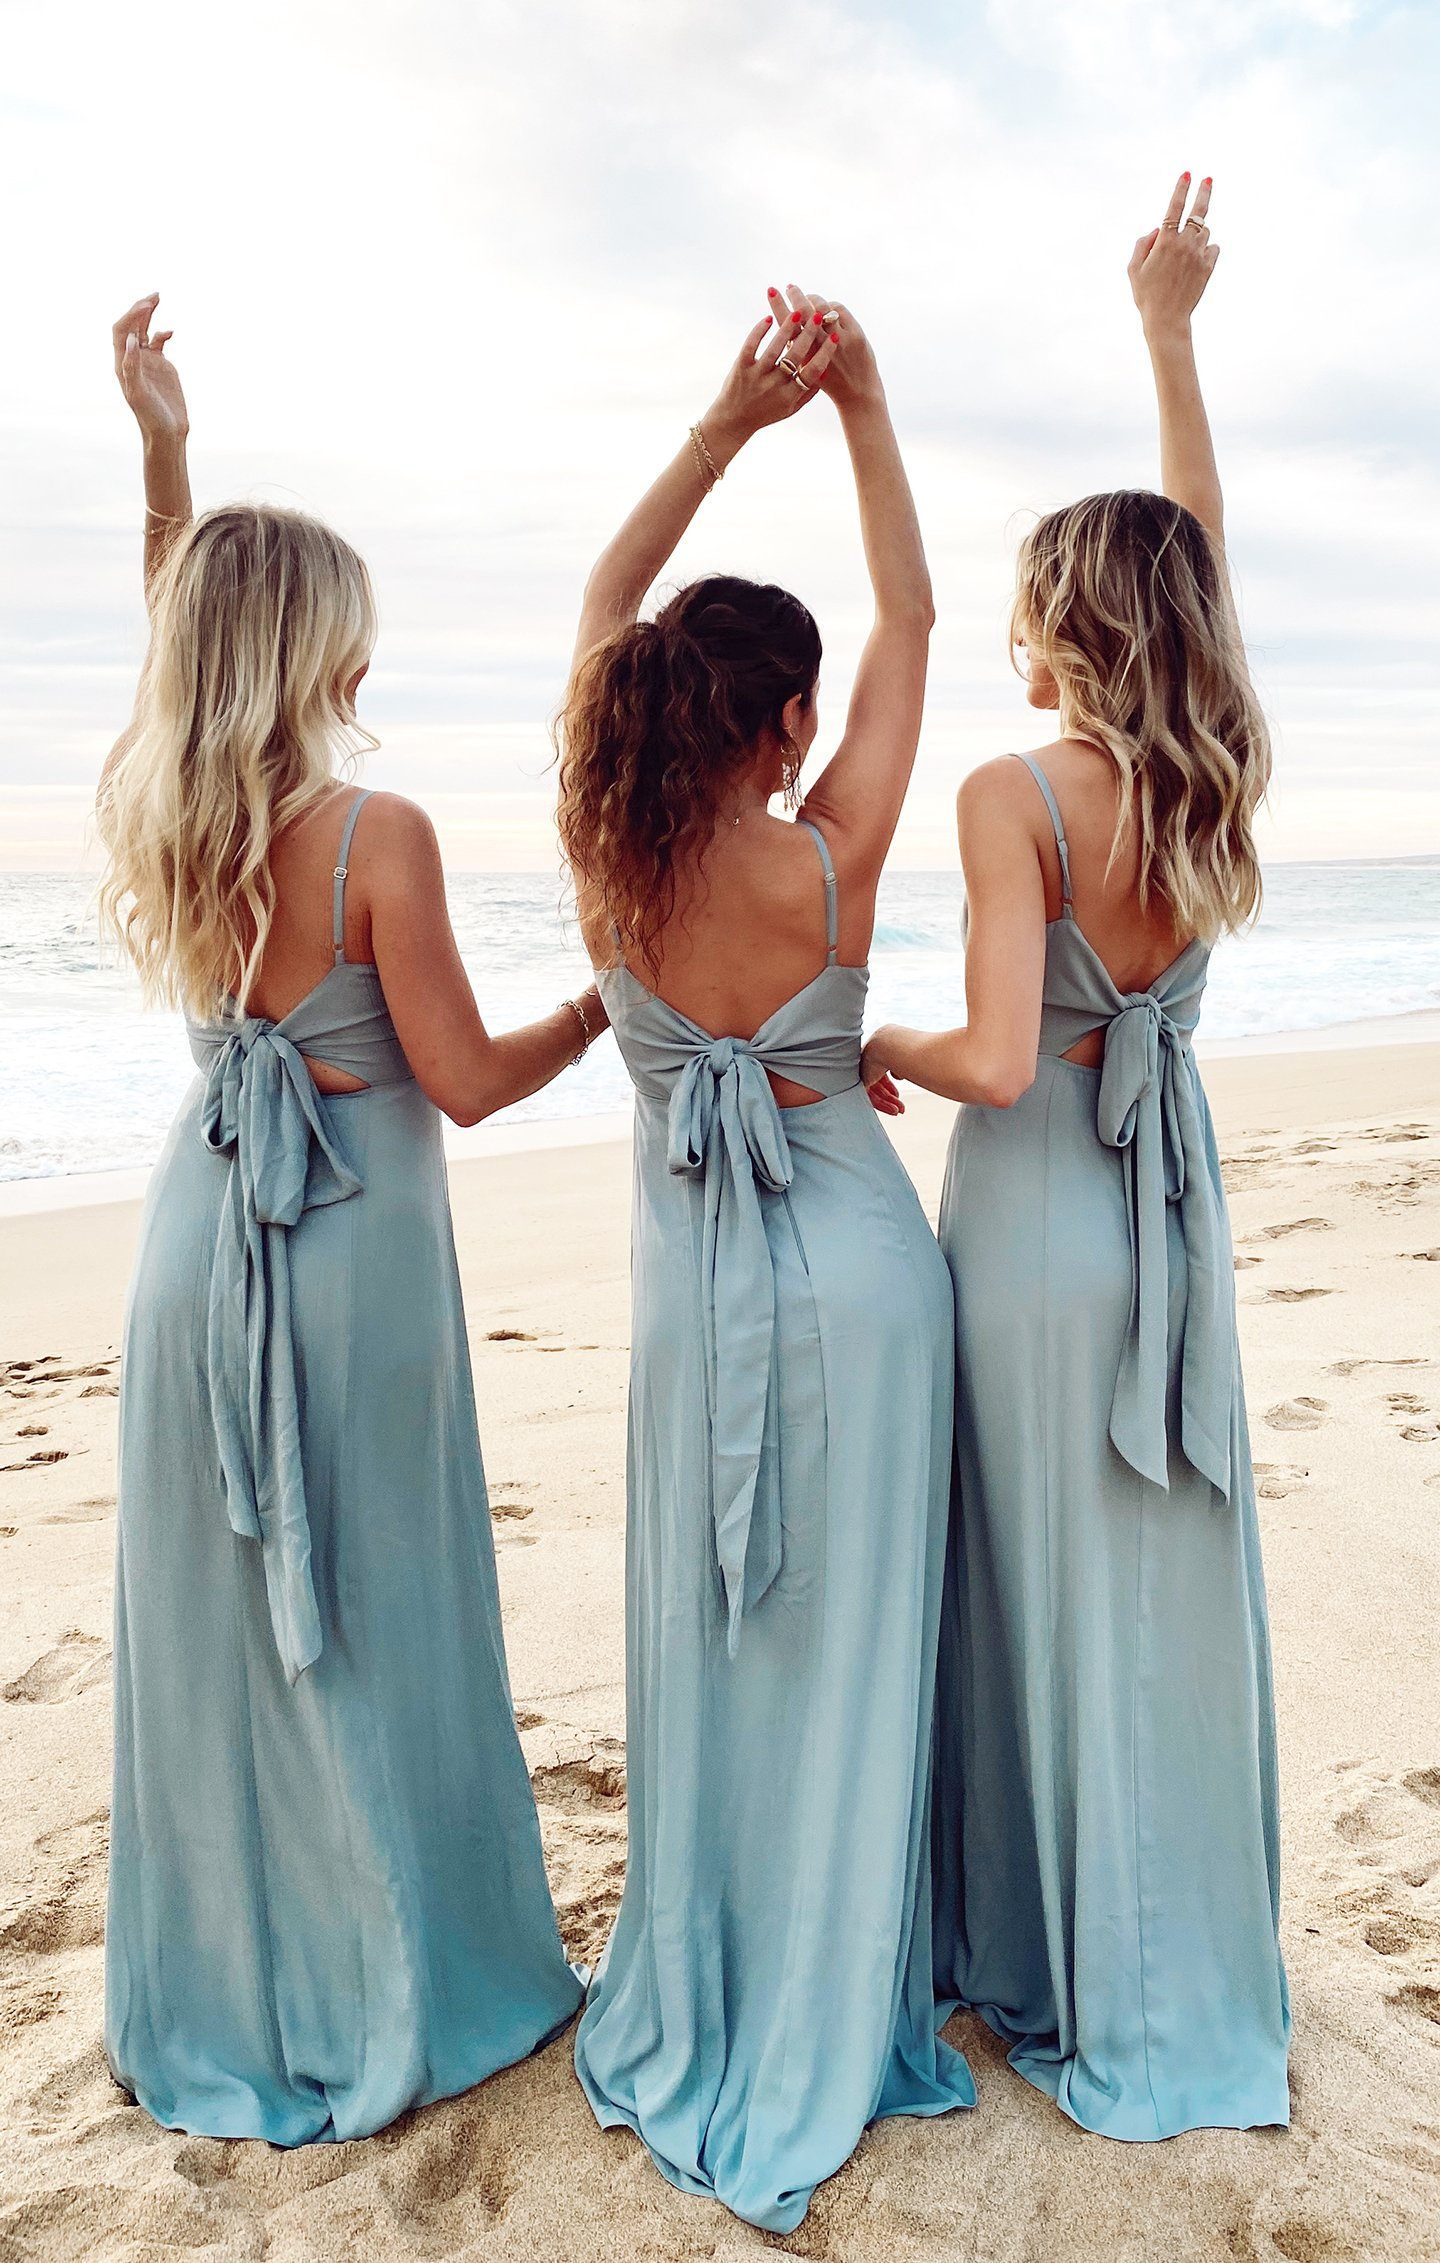 bridesmaid dresses, bridesmaid dress ideas, bridesmaid dress colors, bridesmaid dress styles, affordable bridesmaid dress, blue bridesmaid dress, bow bridesmaid dress, maxi bridesmaid dress